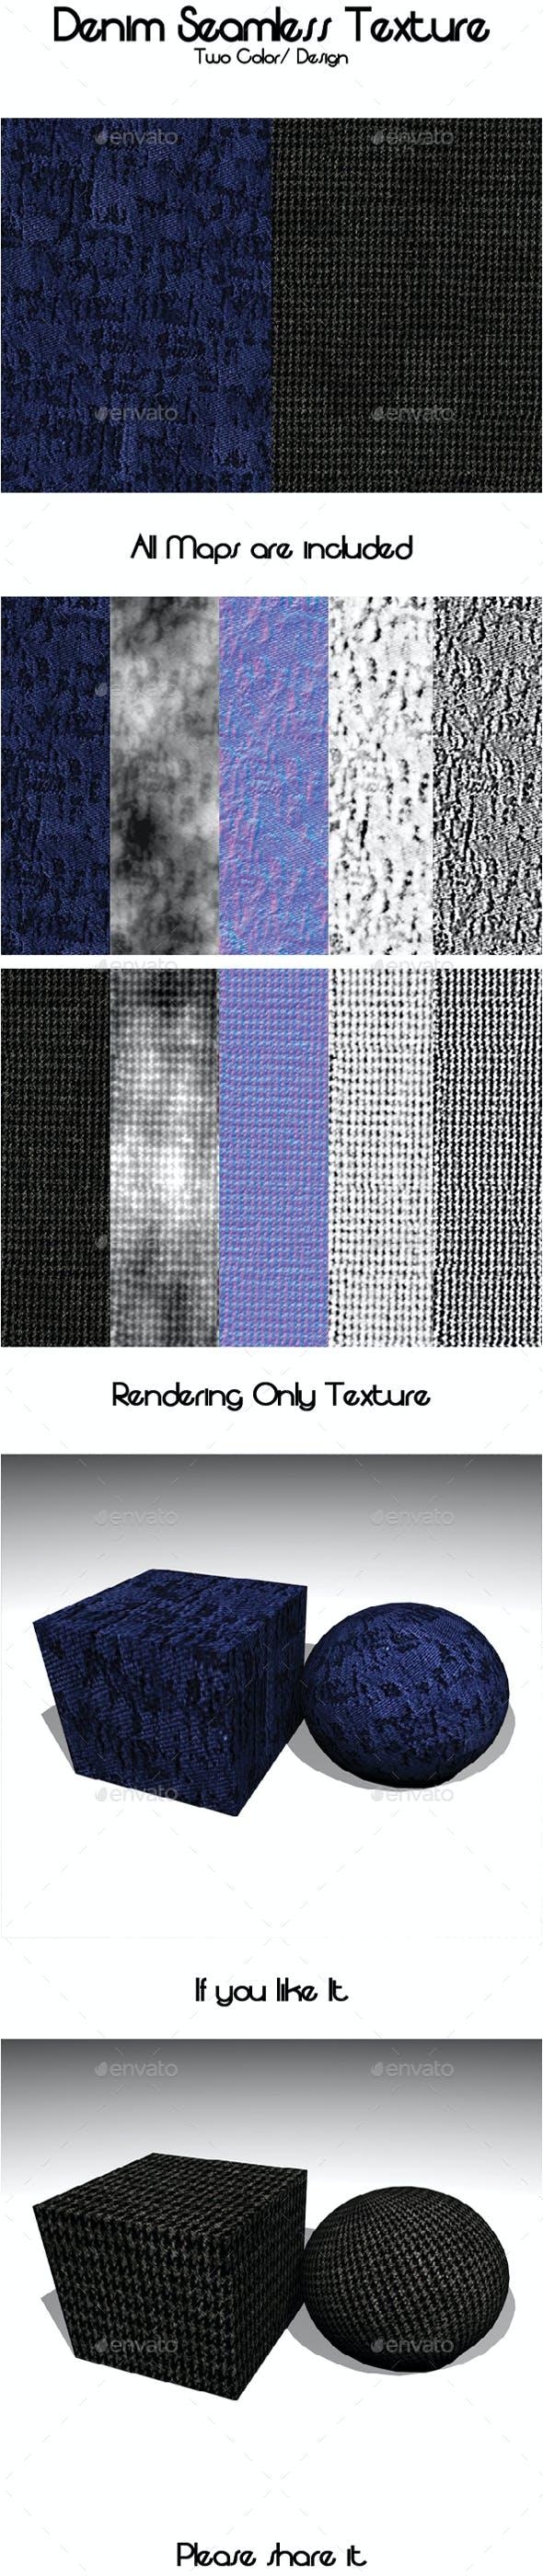 Denim Seamless Texture - 3DOcean Item for Sale